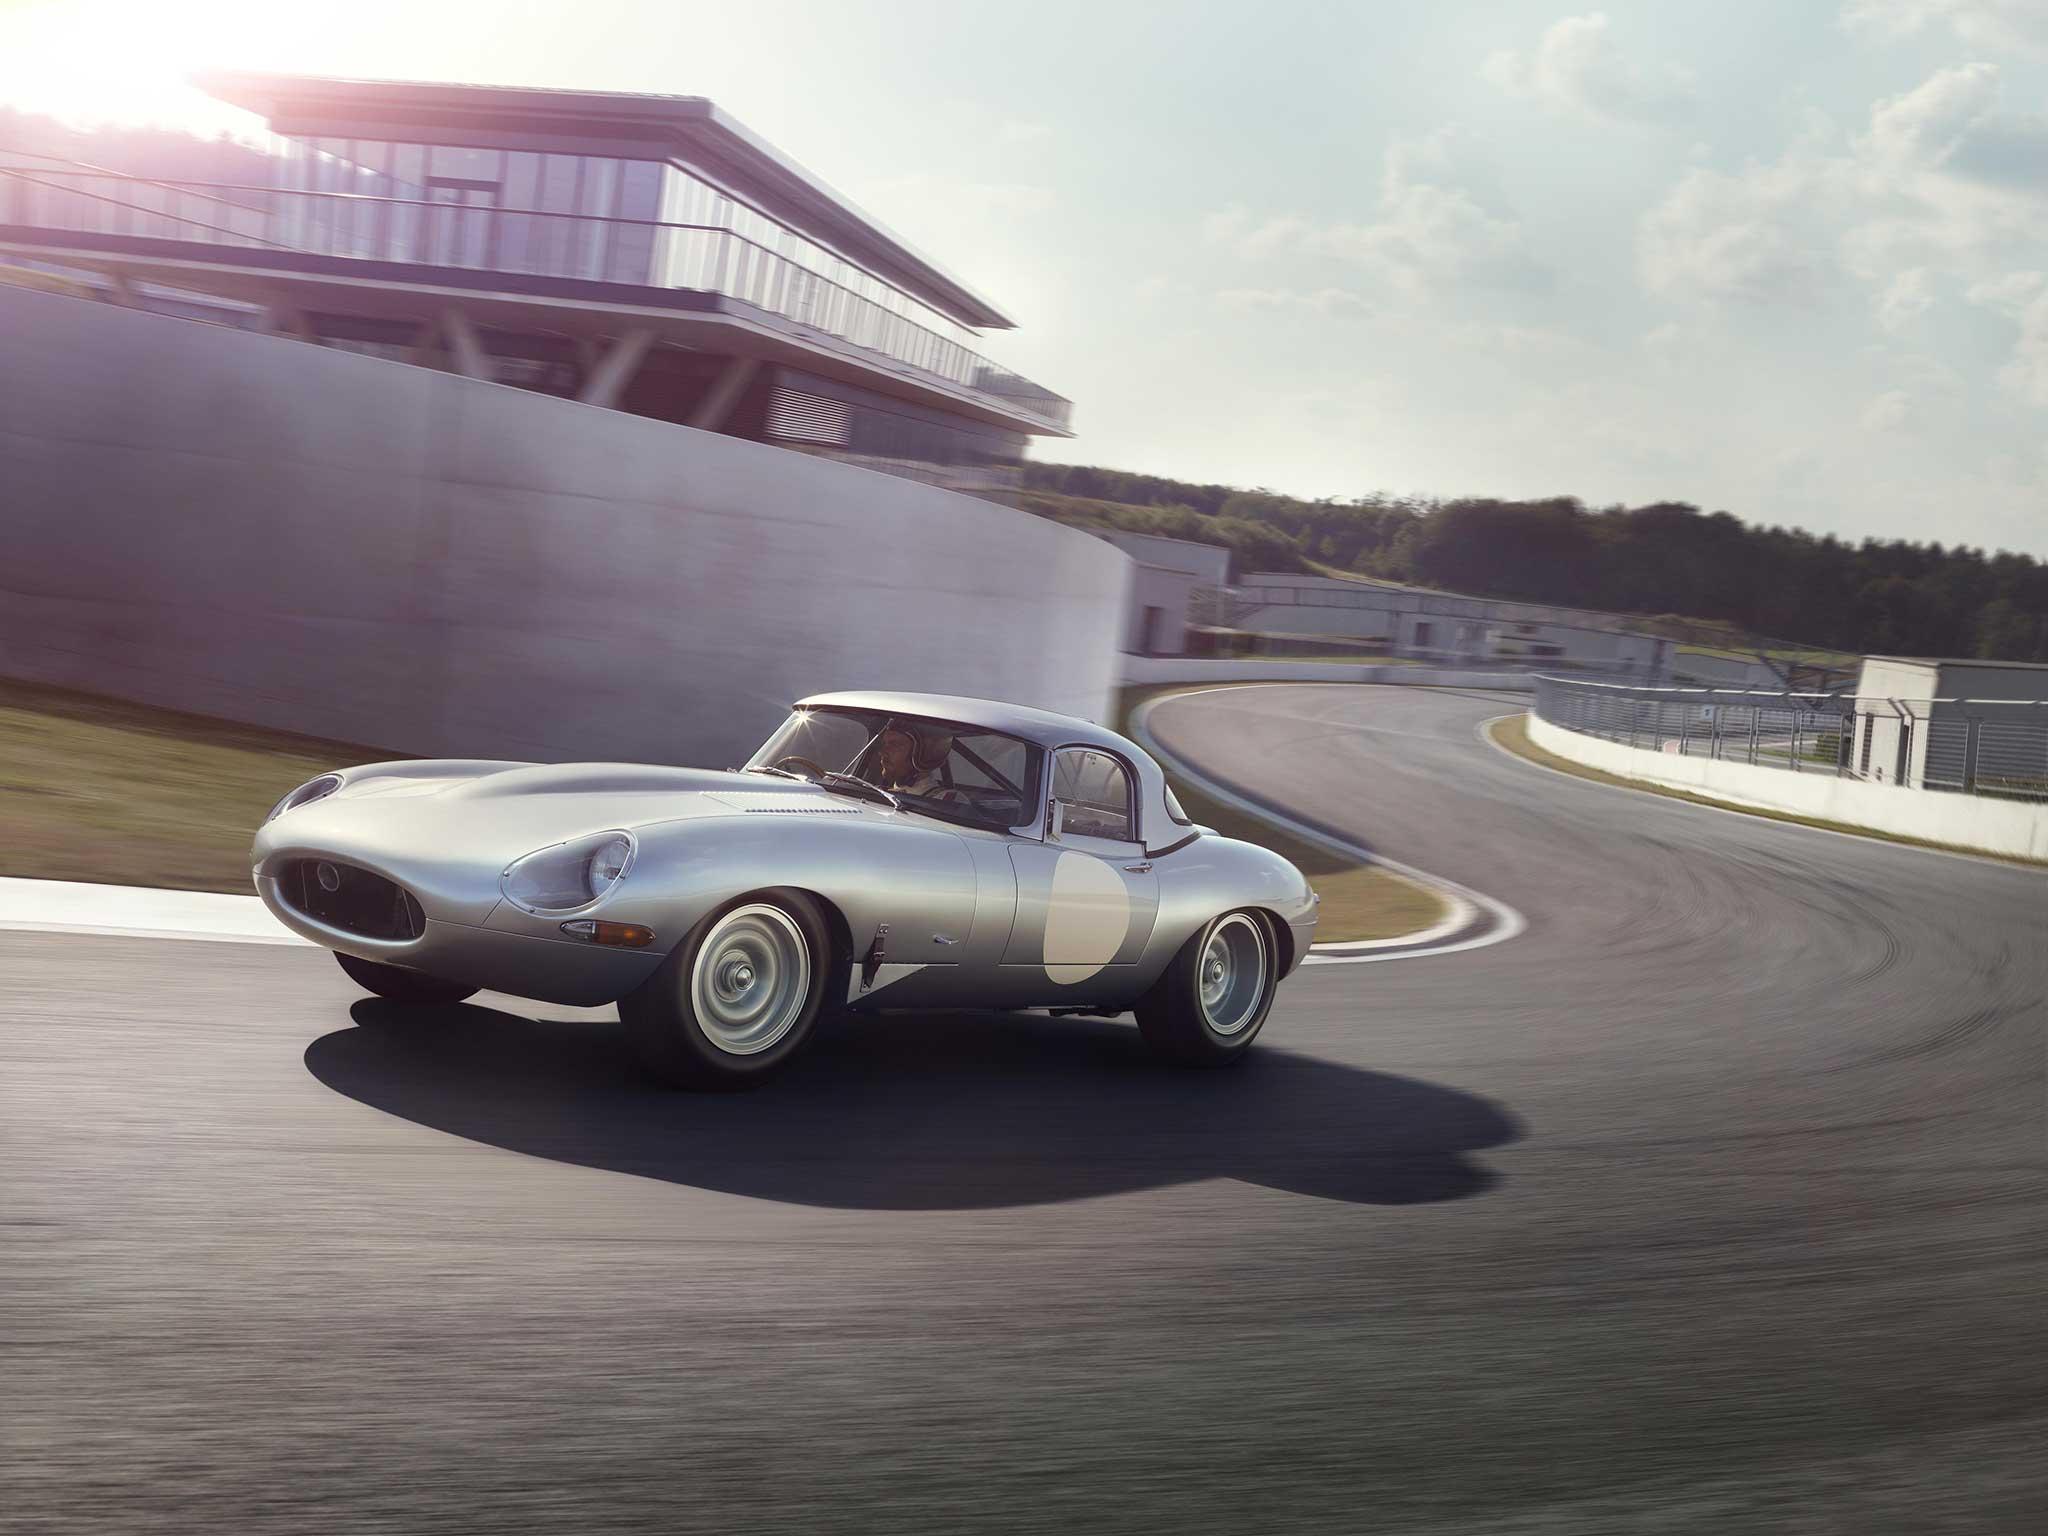 Replica cars: The \'new classics\' roaring back into the lead | The ...